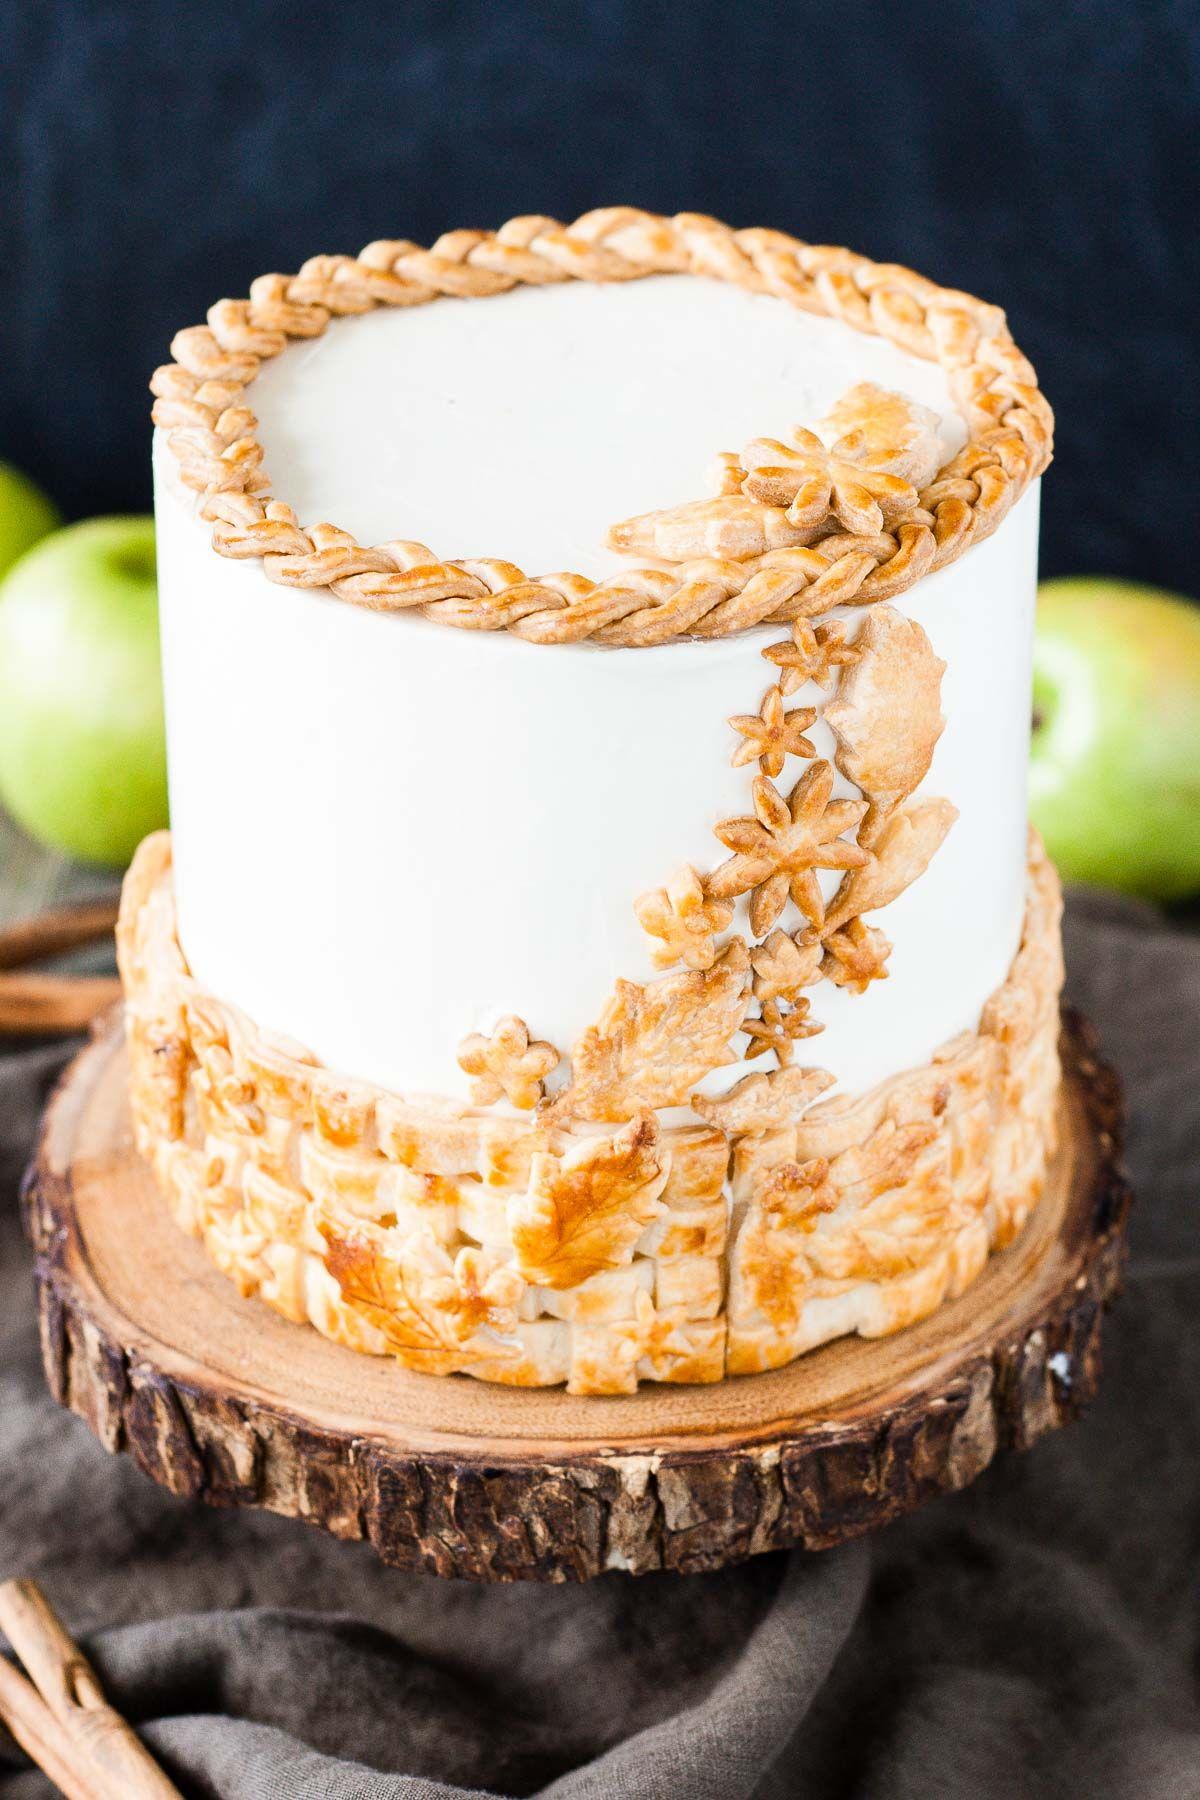 25 Best Fall Cake Recipes - Autumn Cake Flavors